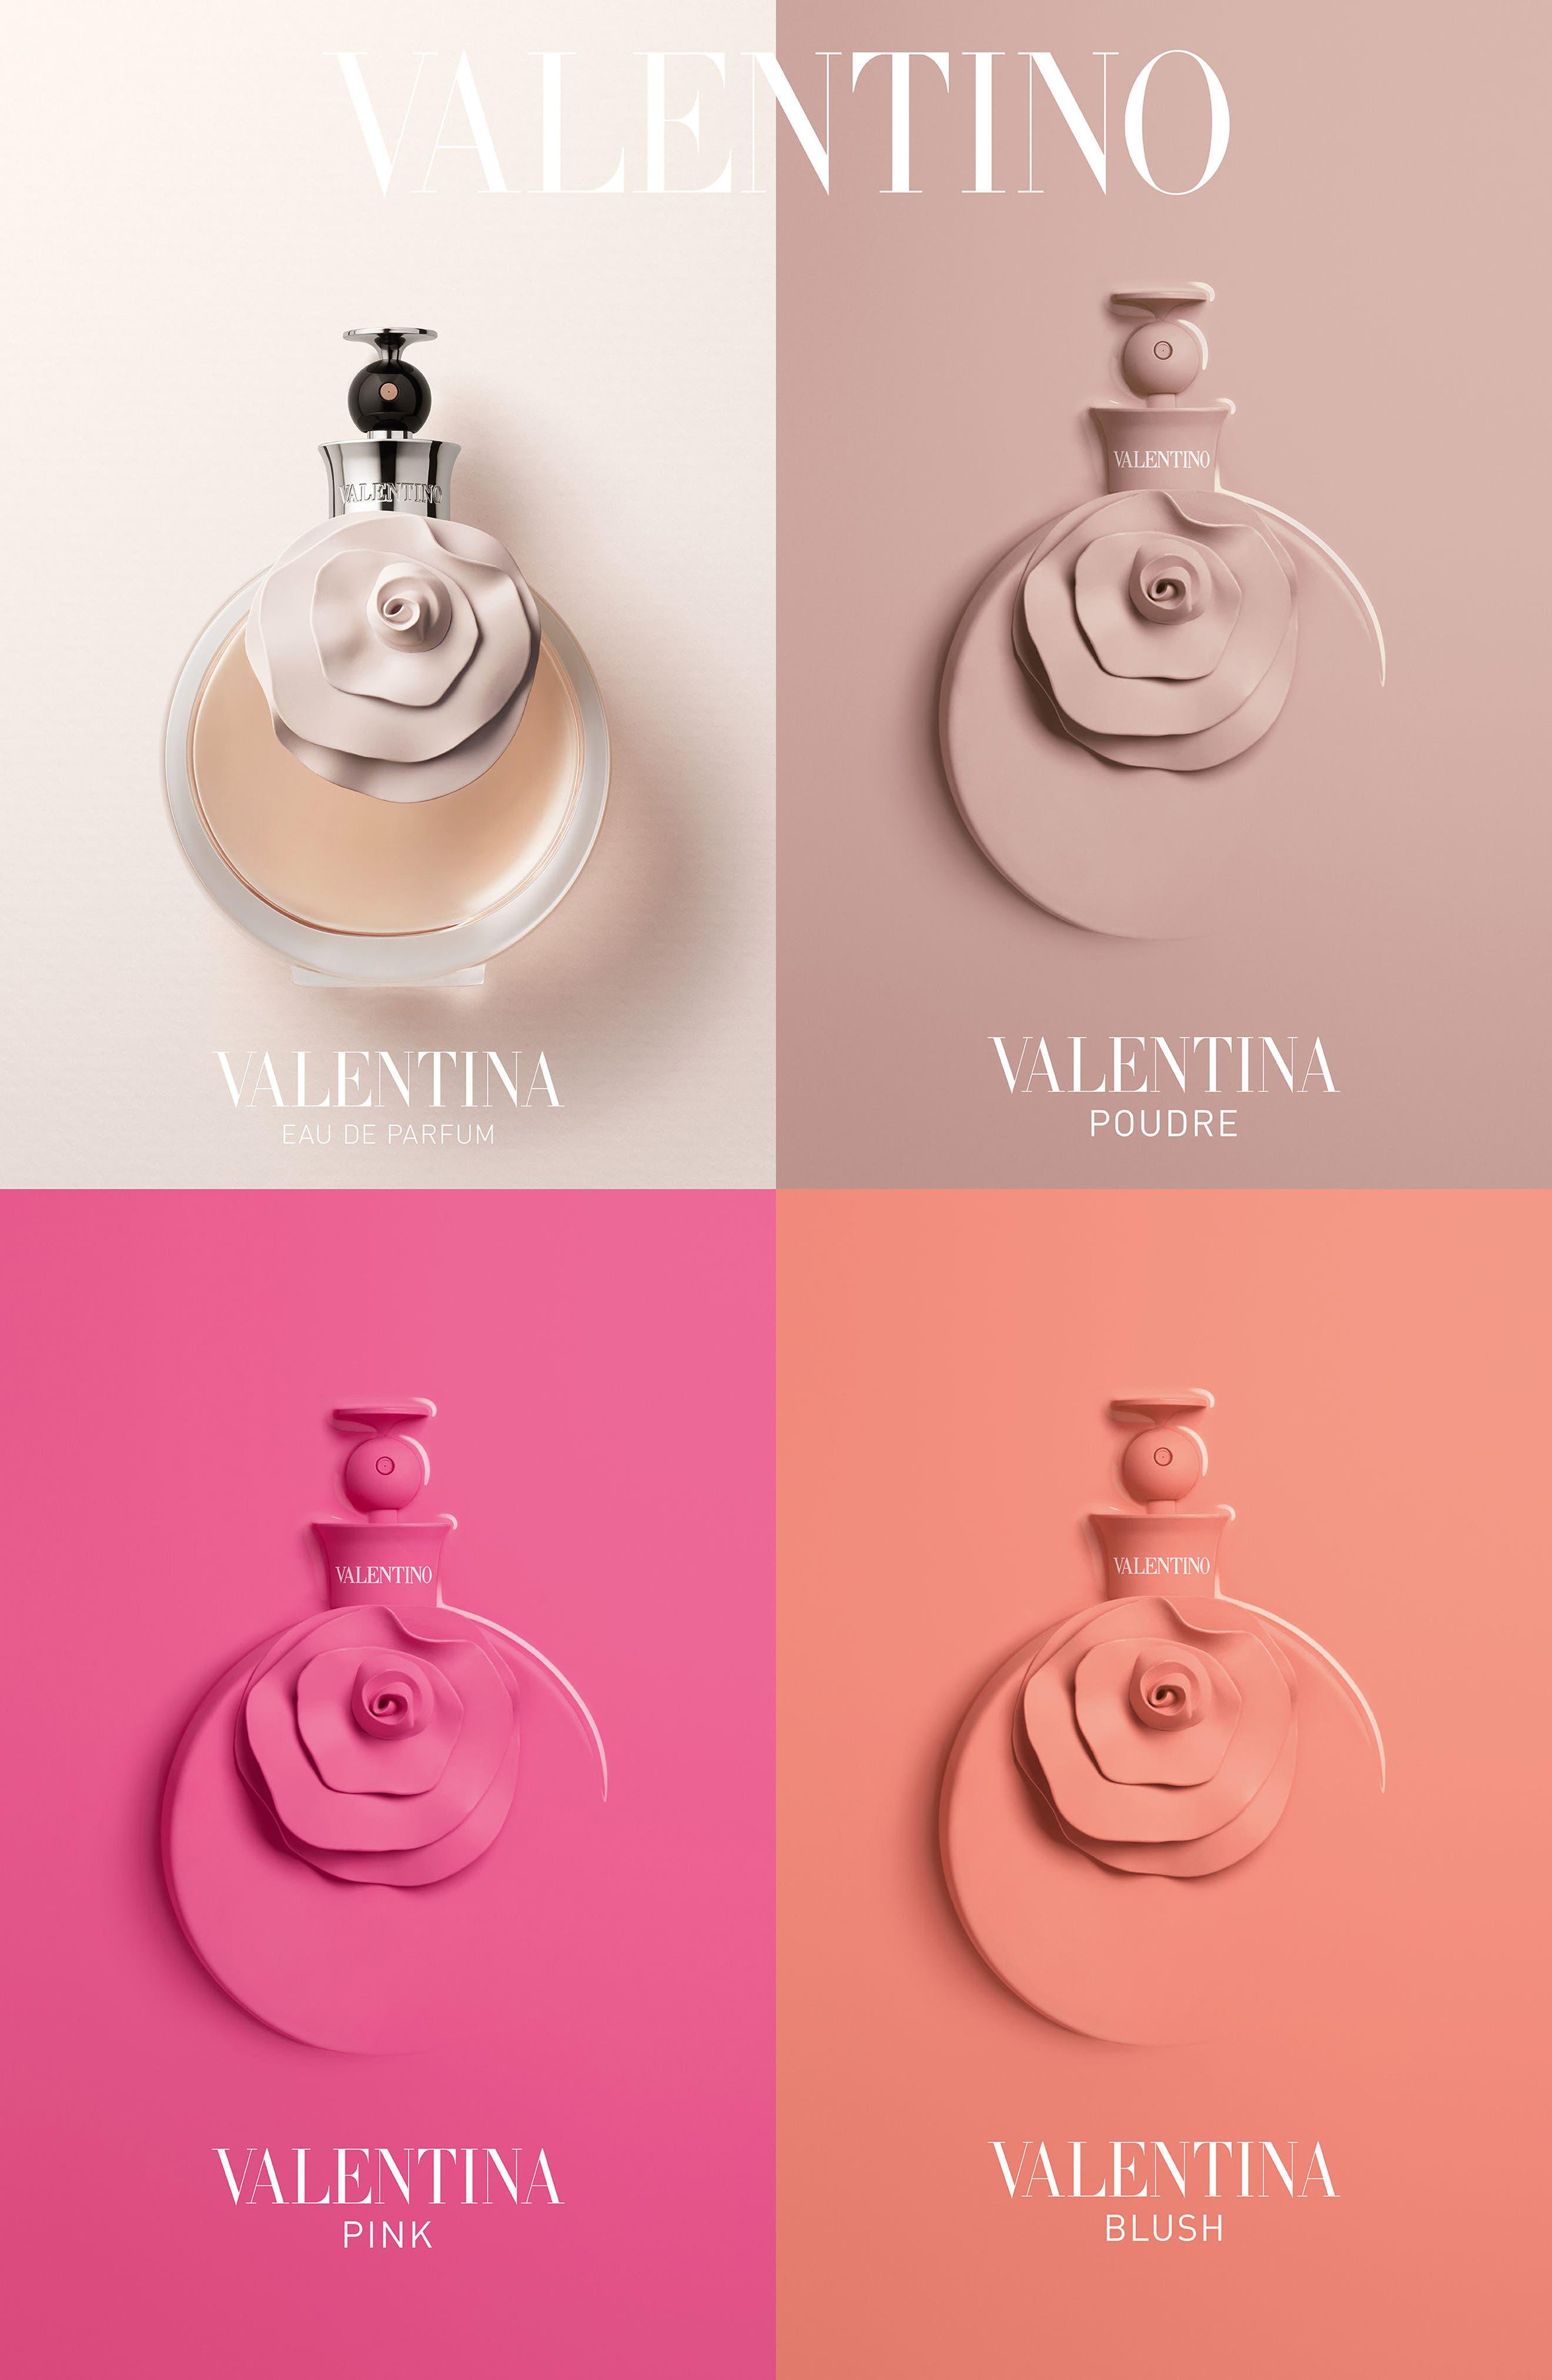 Alternate Image 2  - Valentino Valentina Poudre Eau de Parfum (Nordstrom Exclusive)